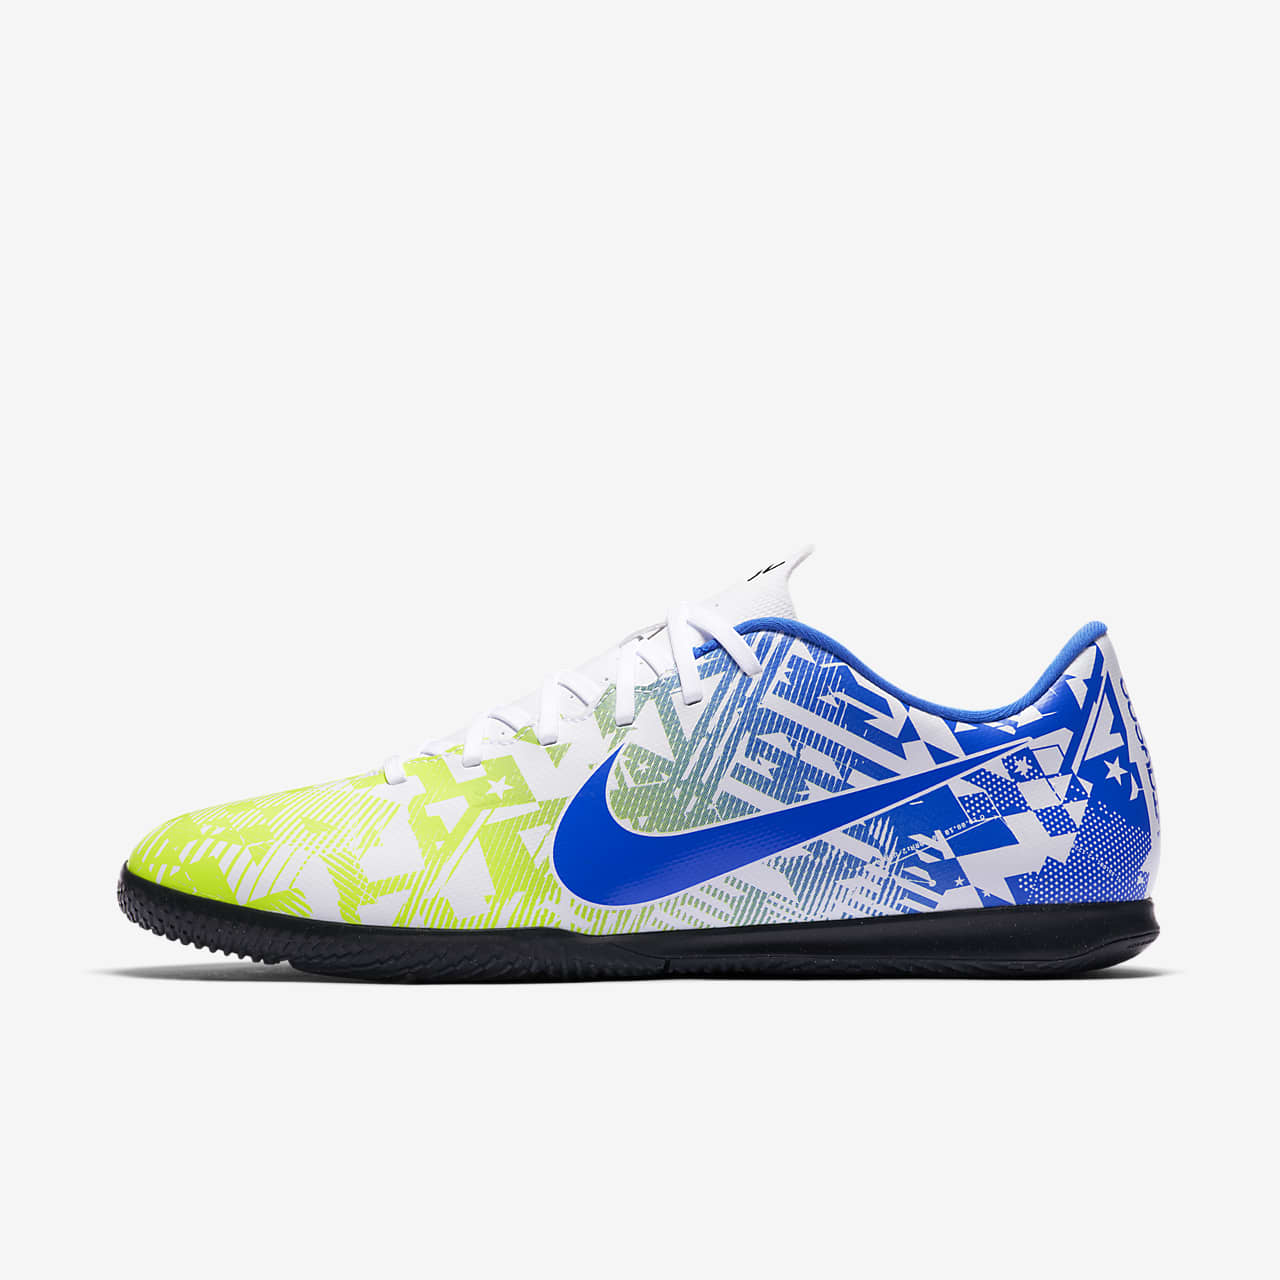 Nike, Buty męskie, Mercurial Vapor 13 Club IC Neymar AT7998